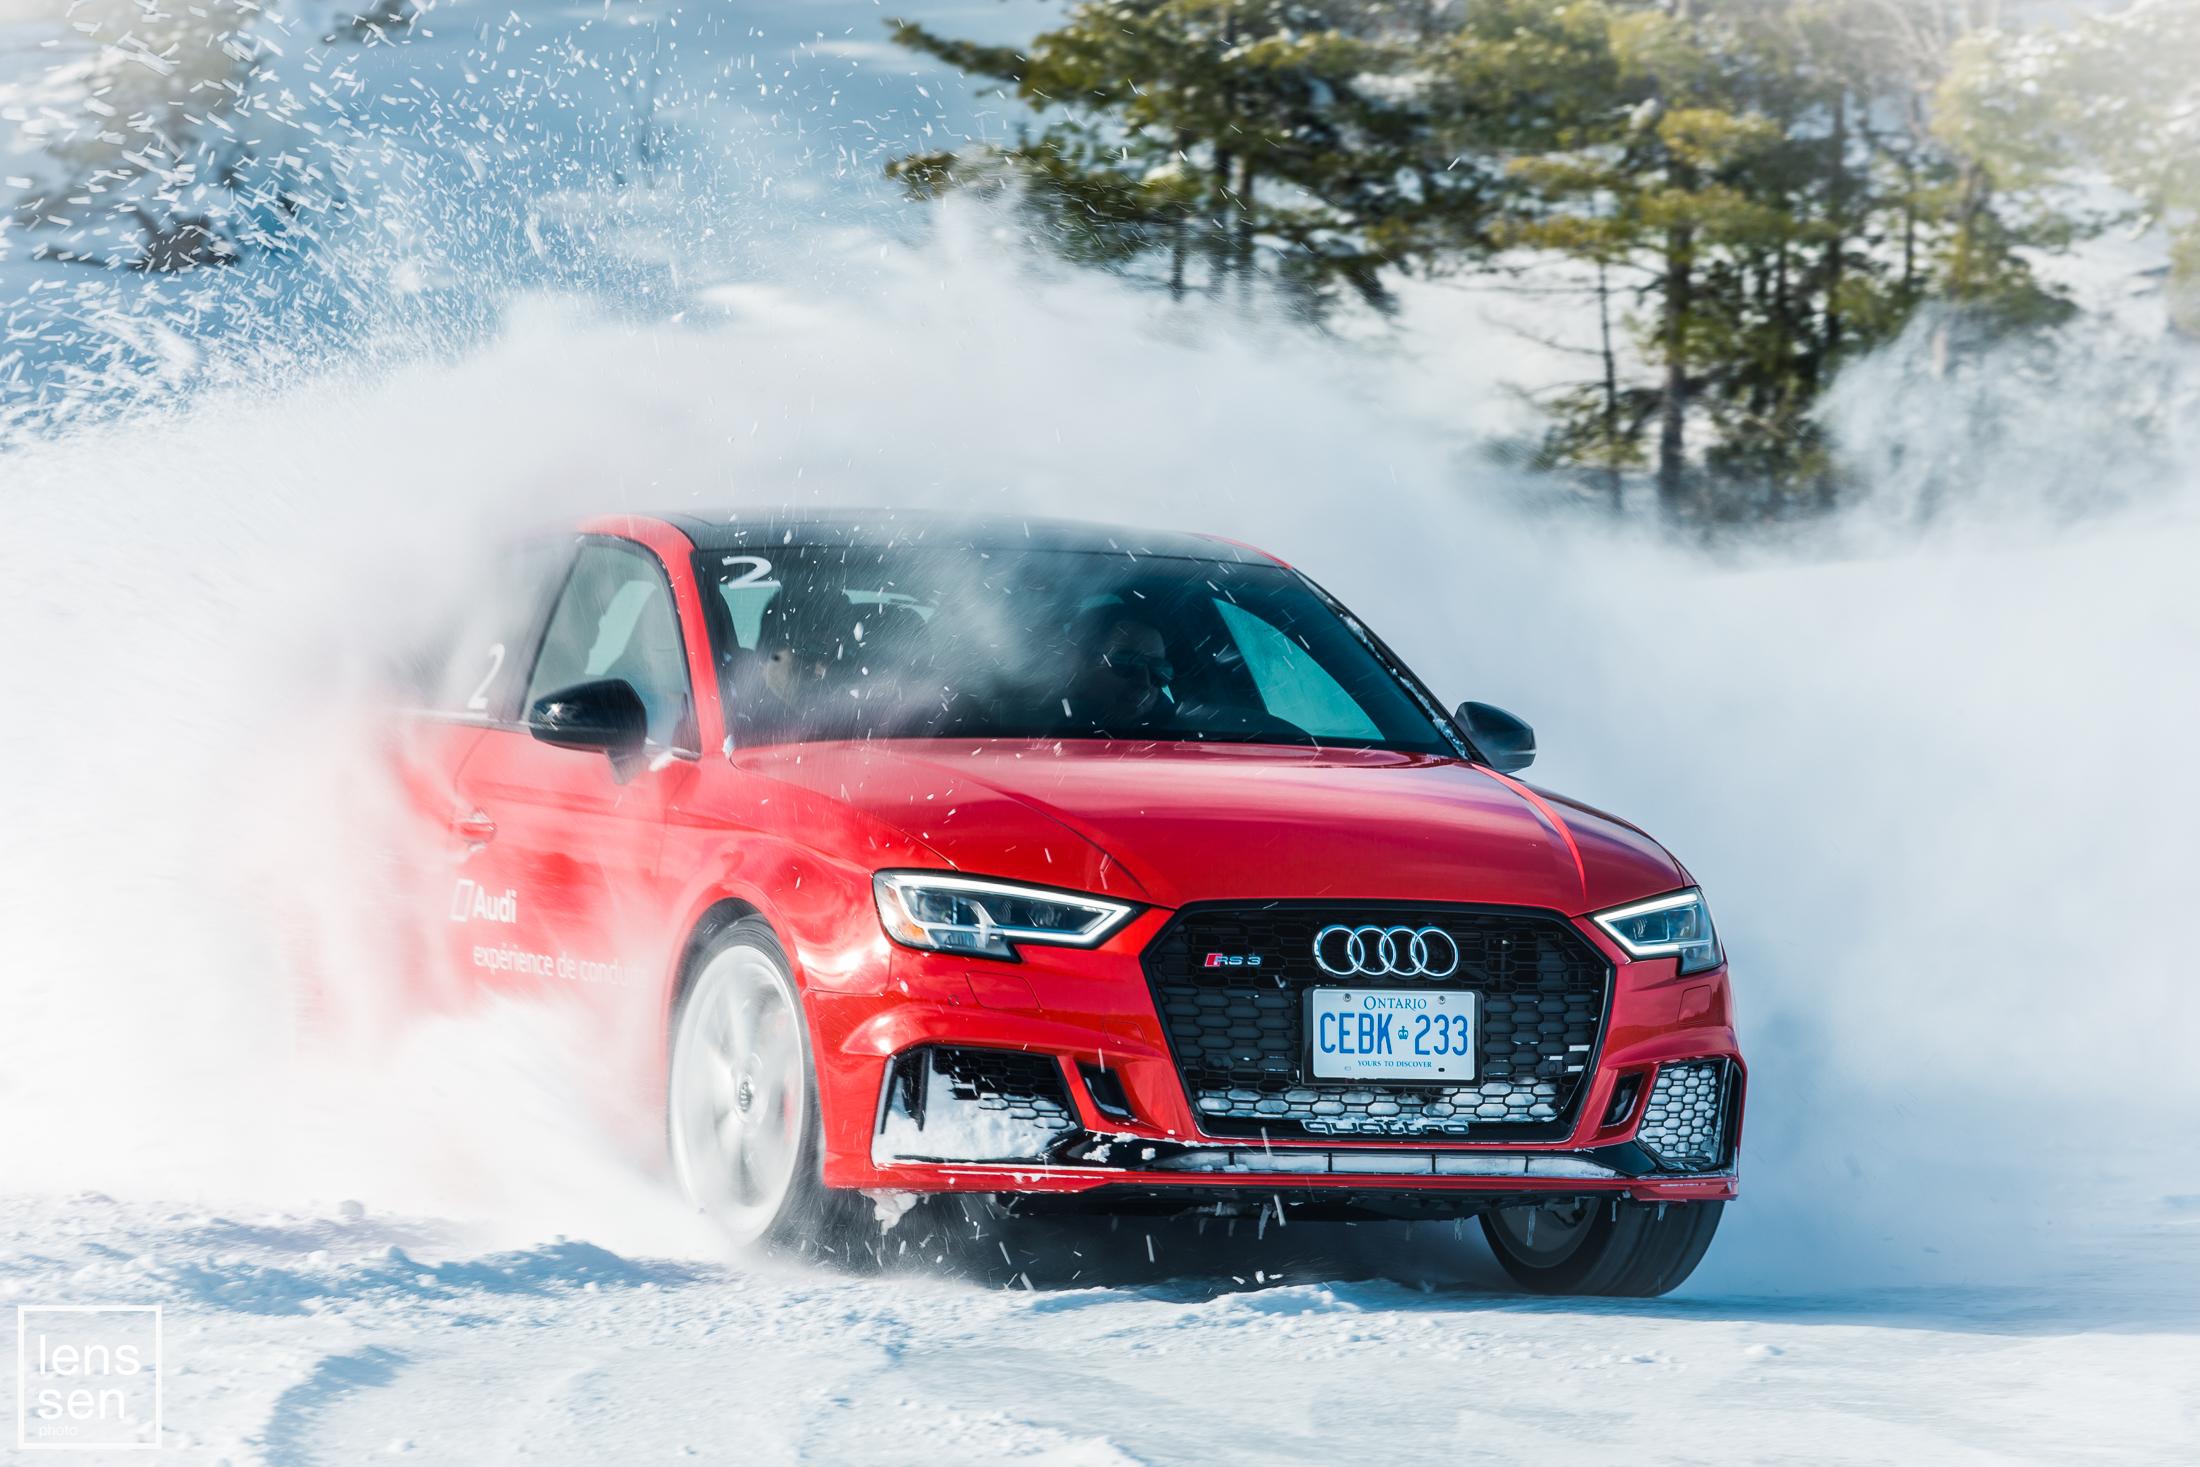 Audi Ice Experience - Sacacomie QC - Feb 2018 - 52 -2925.jpg